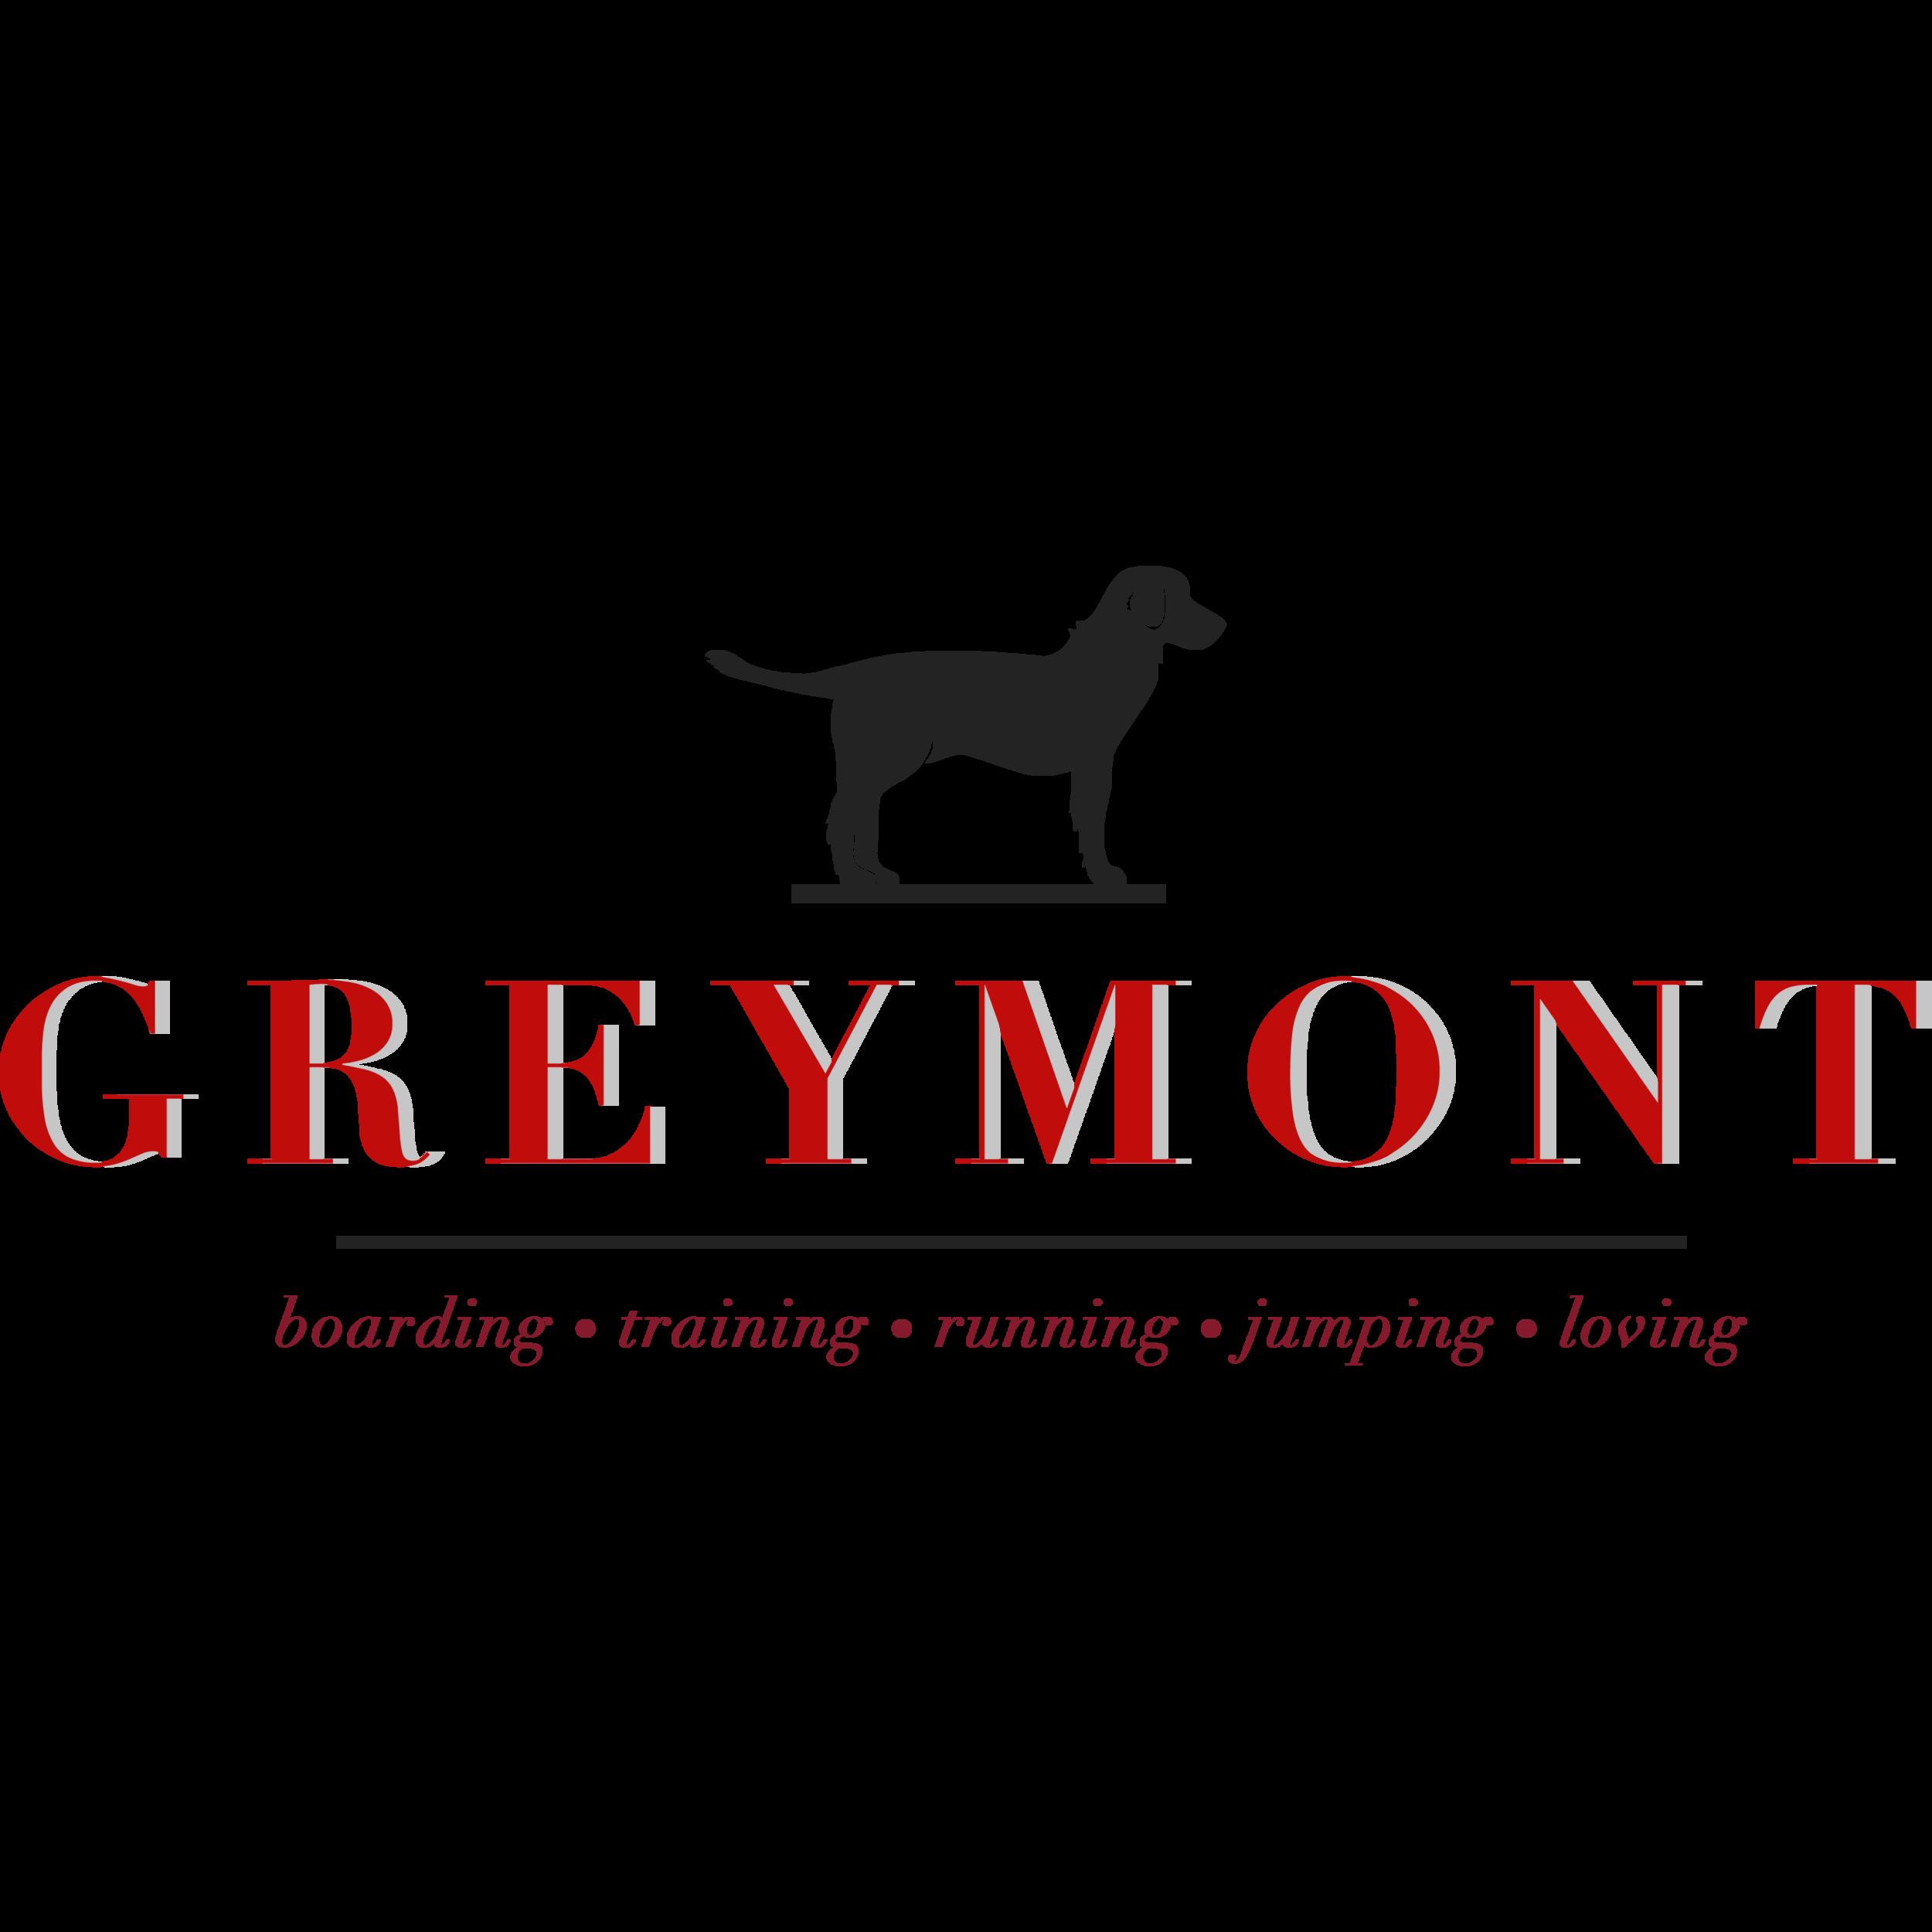 Greymont Kennel